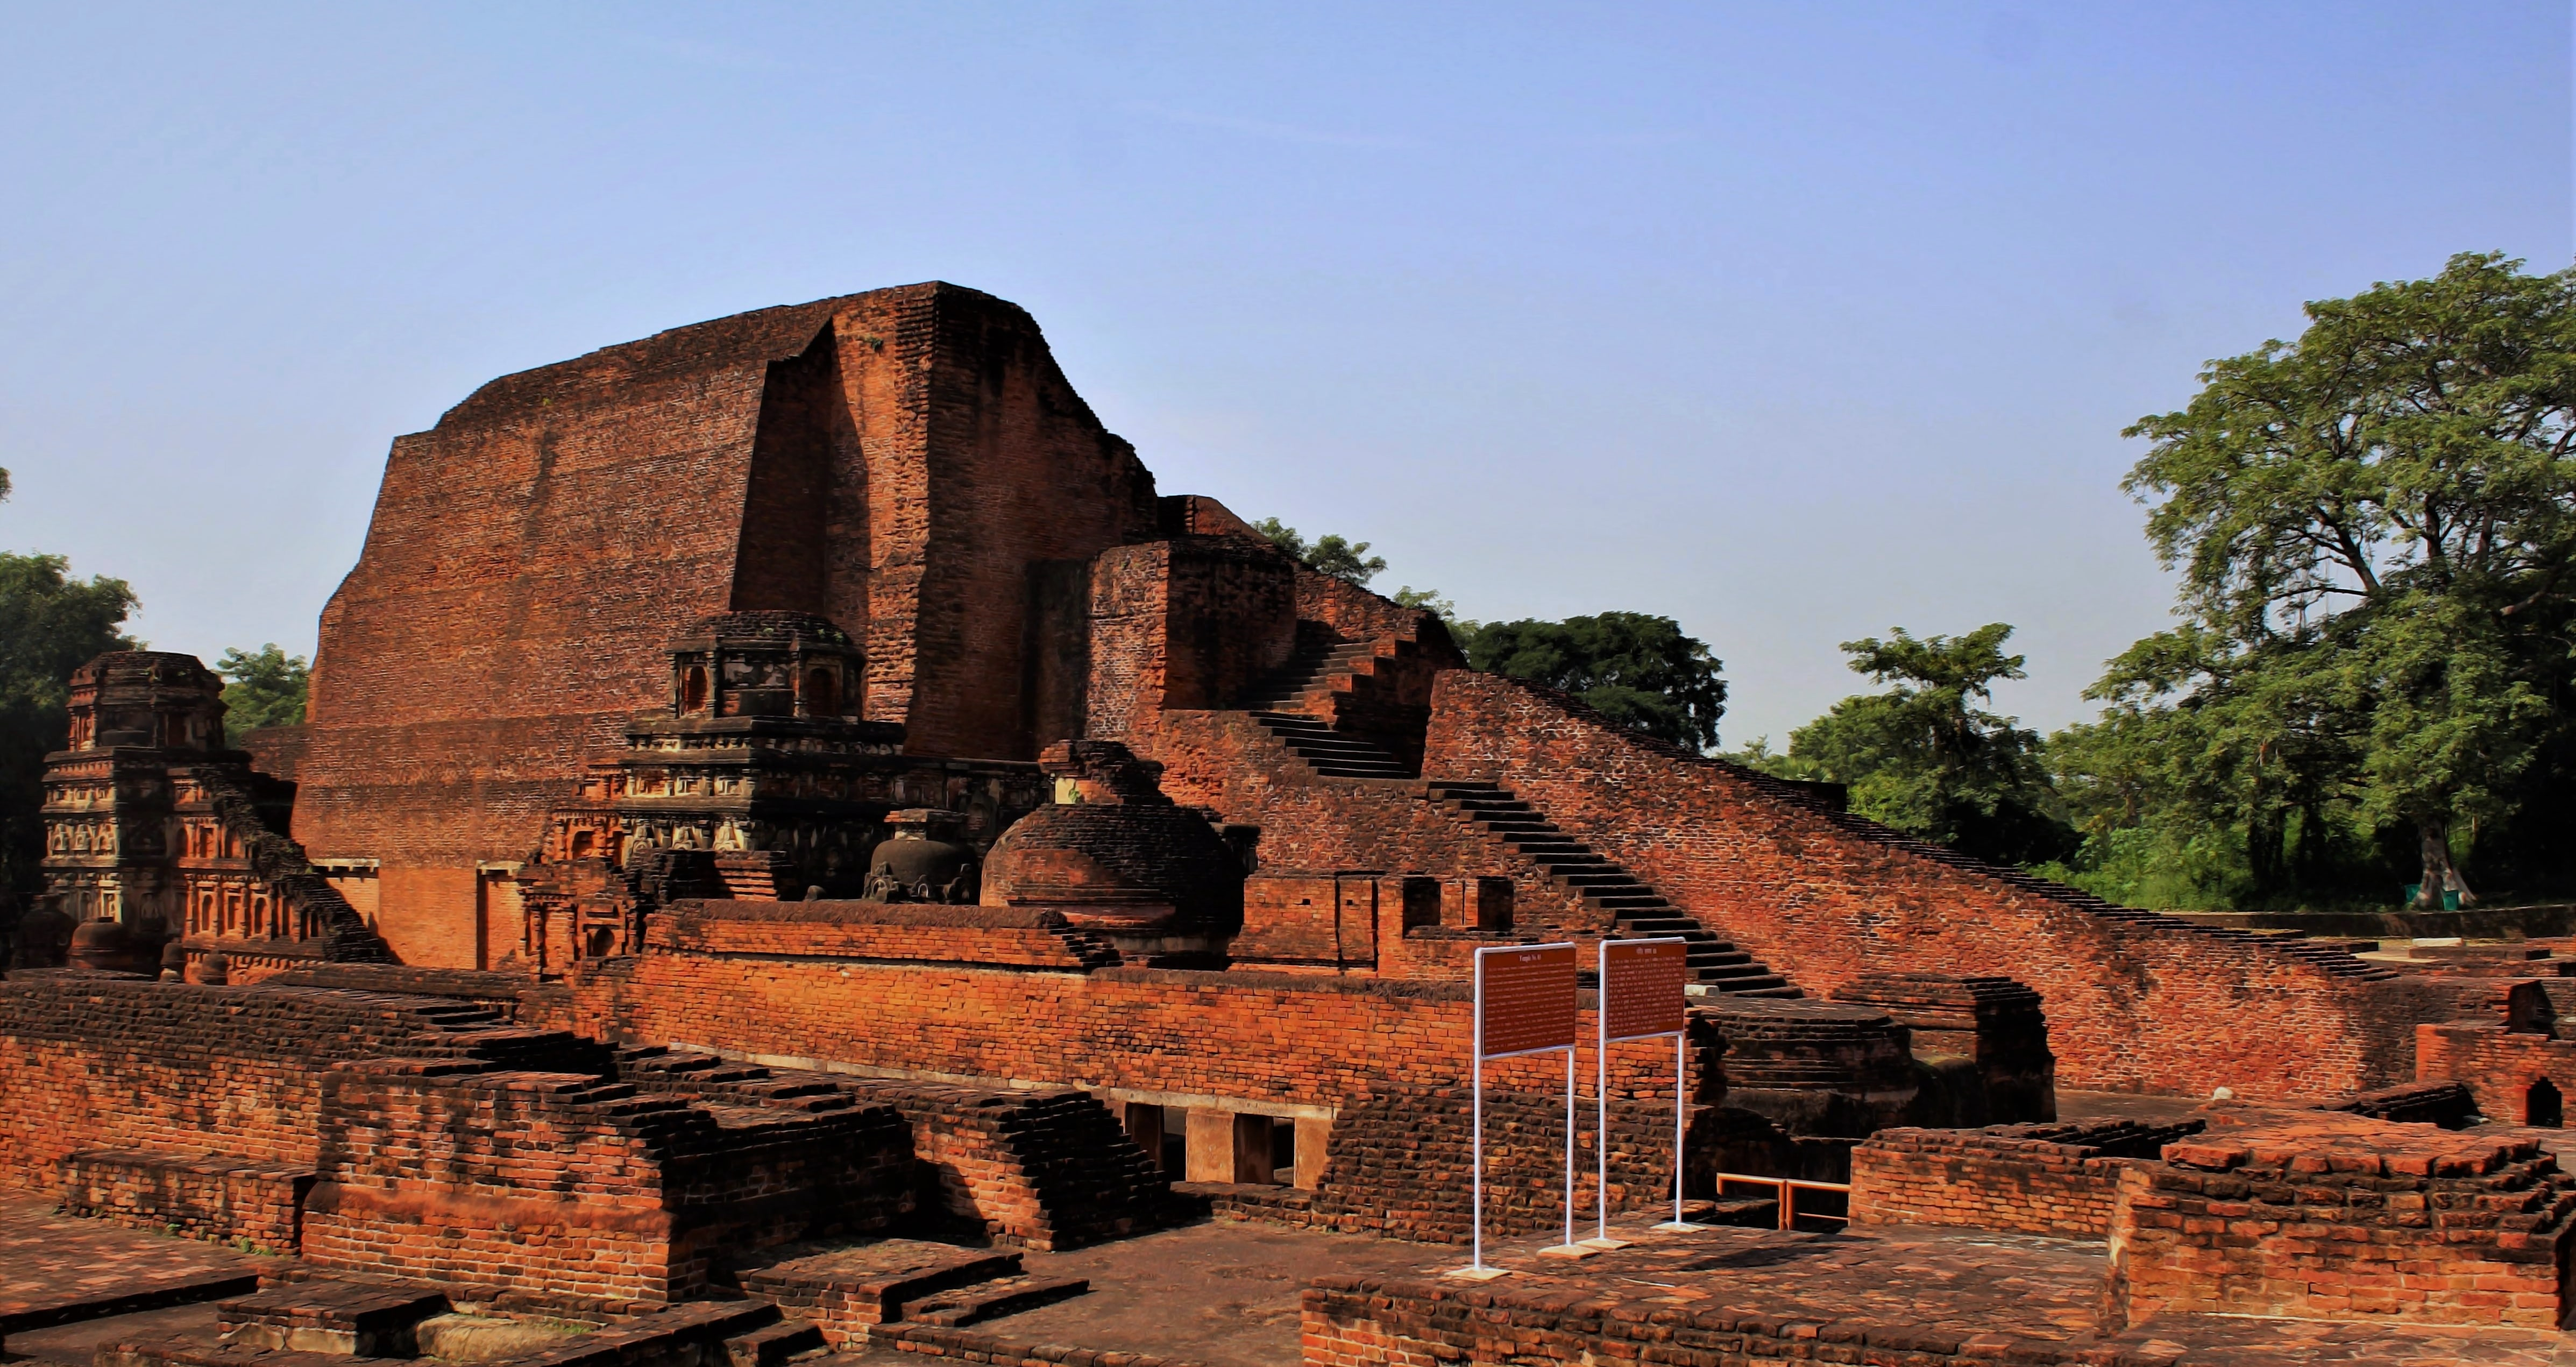 Shantideva: Seventeen Great Pandits of Nalanda - Episode 45 of the Bob Thurman Podcast Image via Wikimedia.